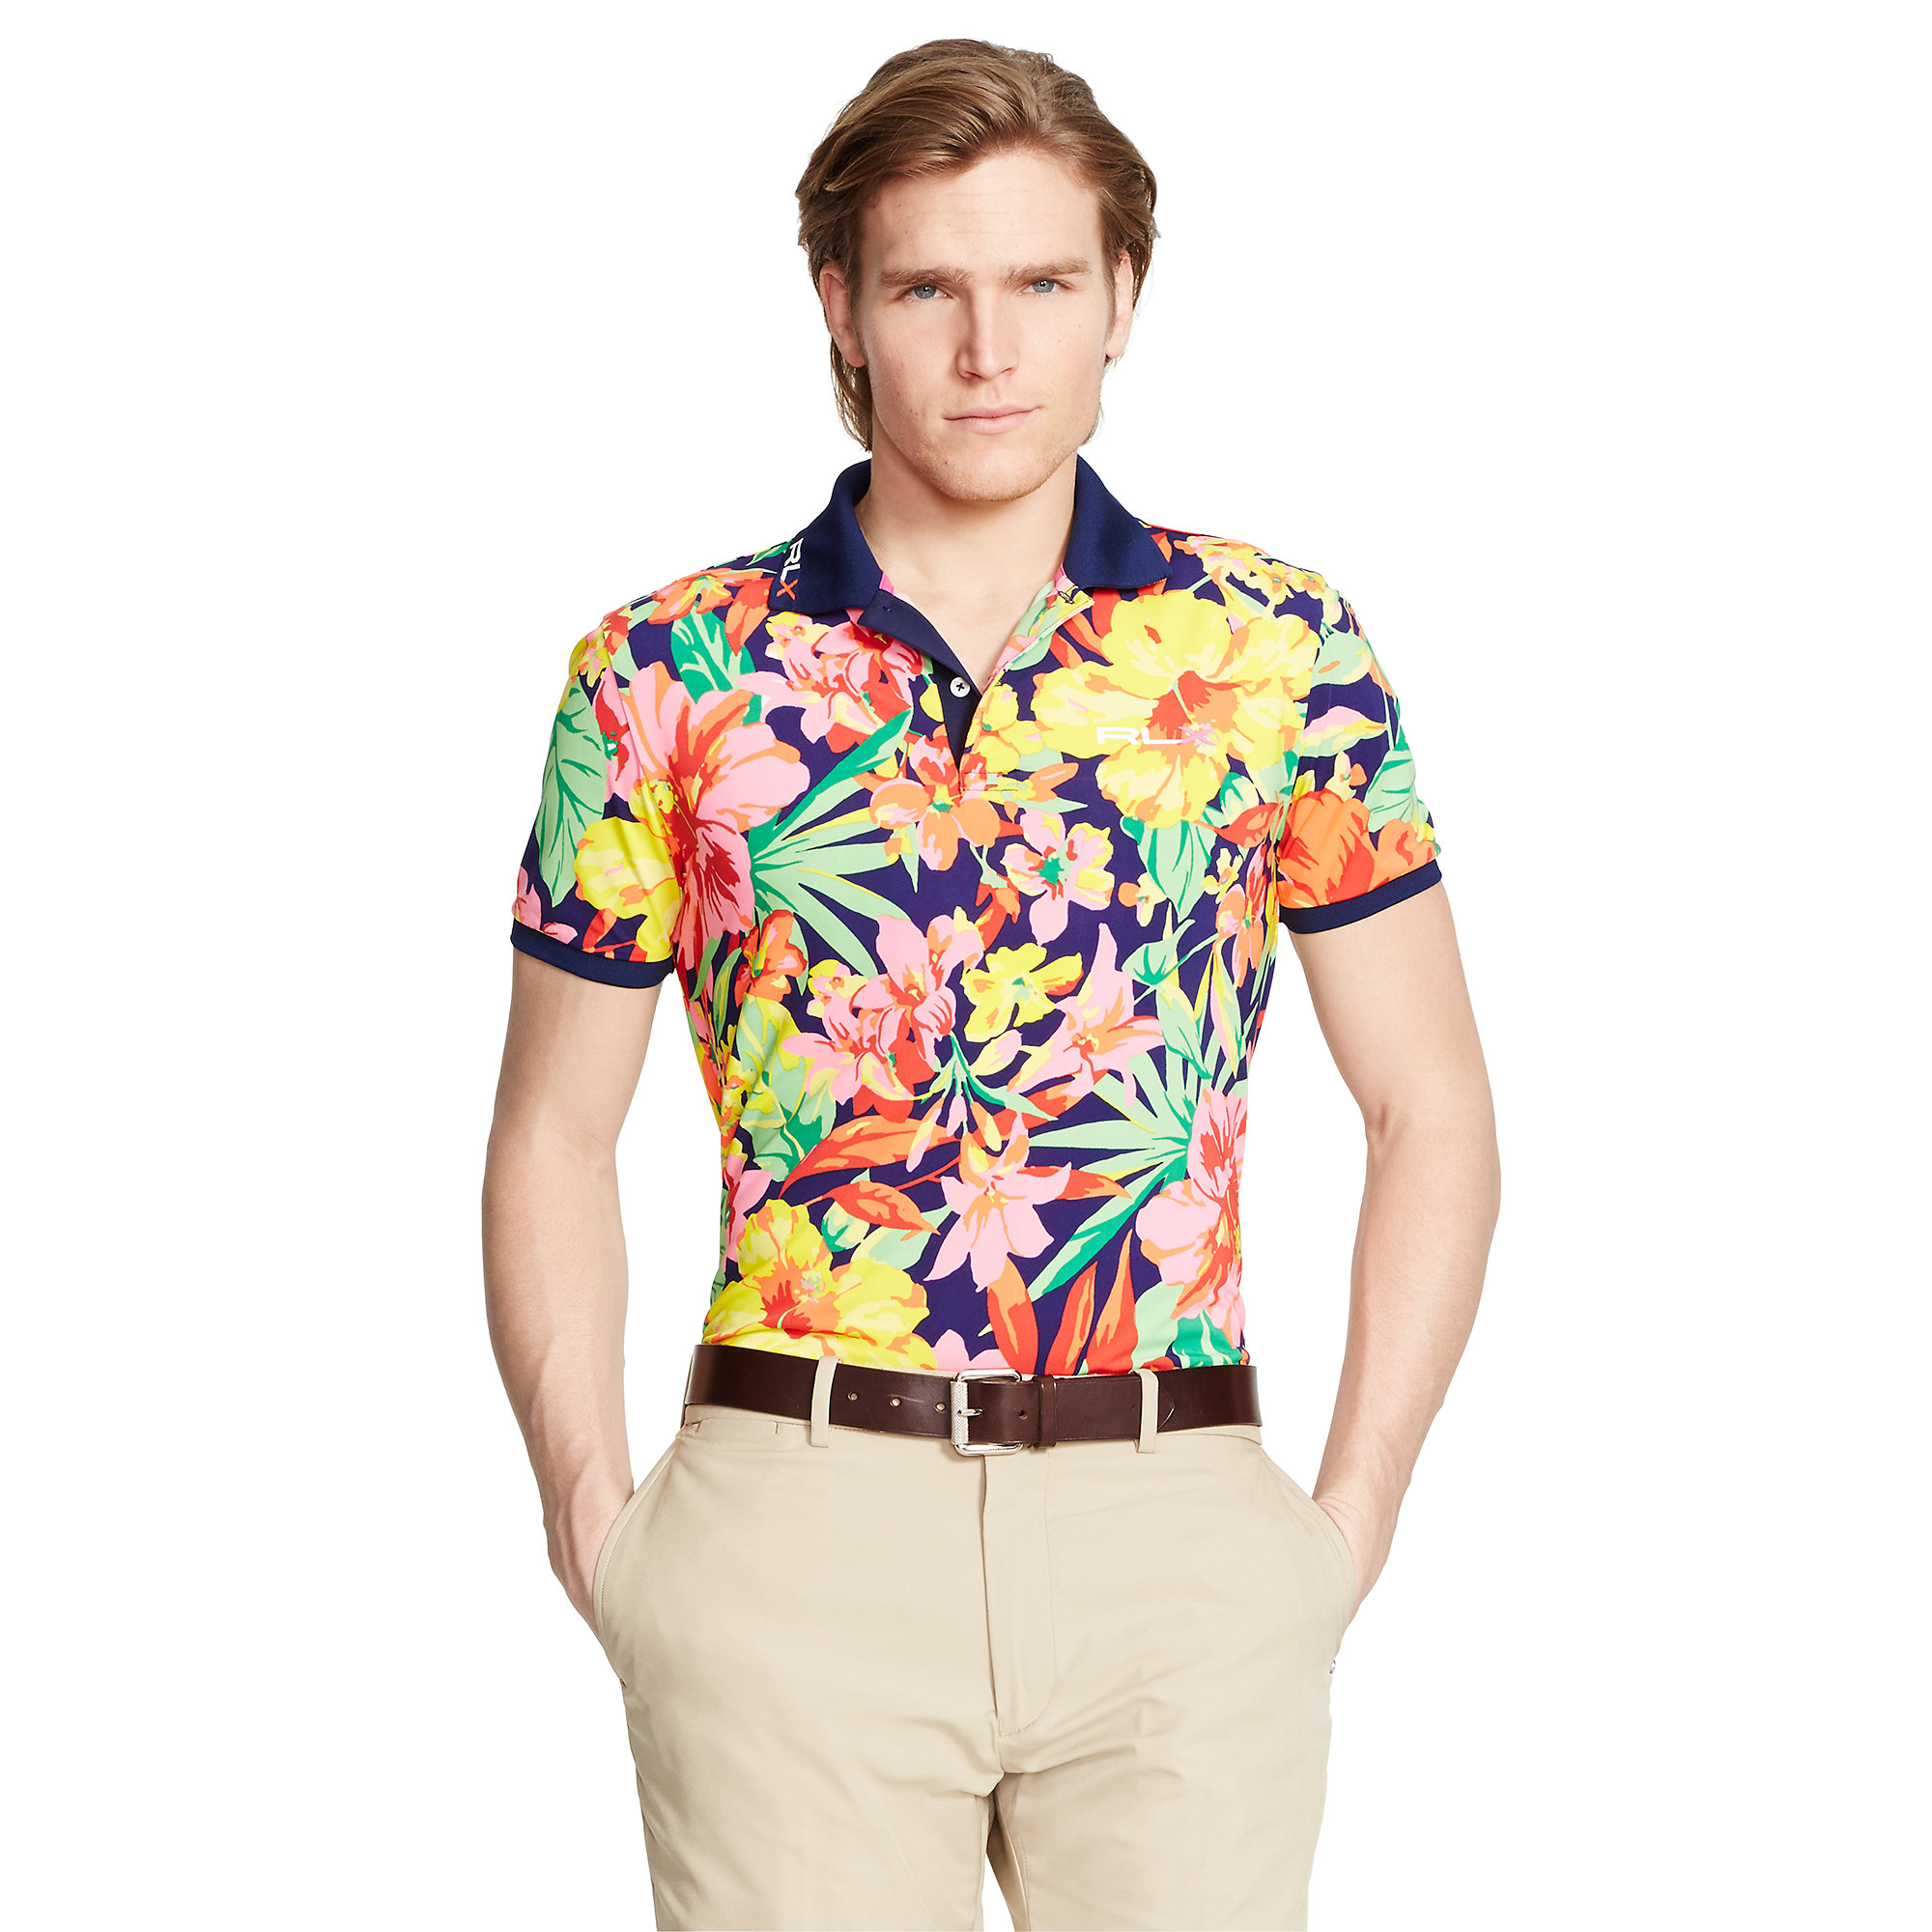 3f144167825f1 Lyst - Ralph Lauren Pro-Fit Floral Polo Shirt for Men